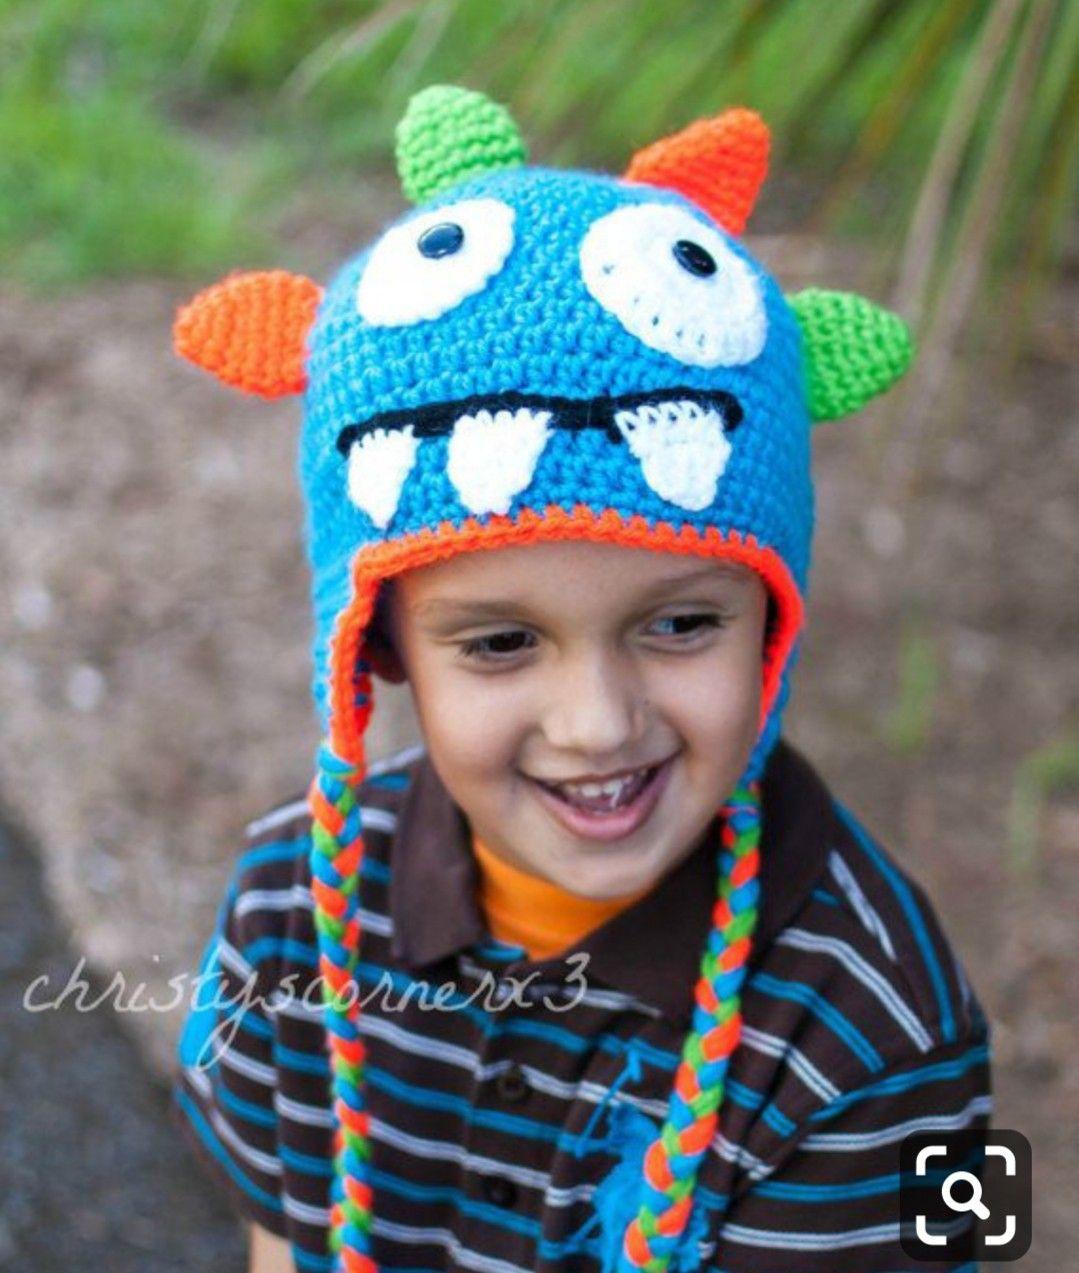 b81d10a466f Autumn Winter Crochet Monster Knitted Cap Newborn Infant Toddler Baby Boys  Girls Christmas Hat Children Kids Cartoon Animal Beanie Headdress Baby Hat  ...